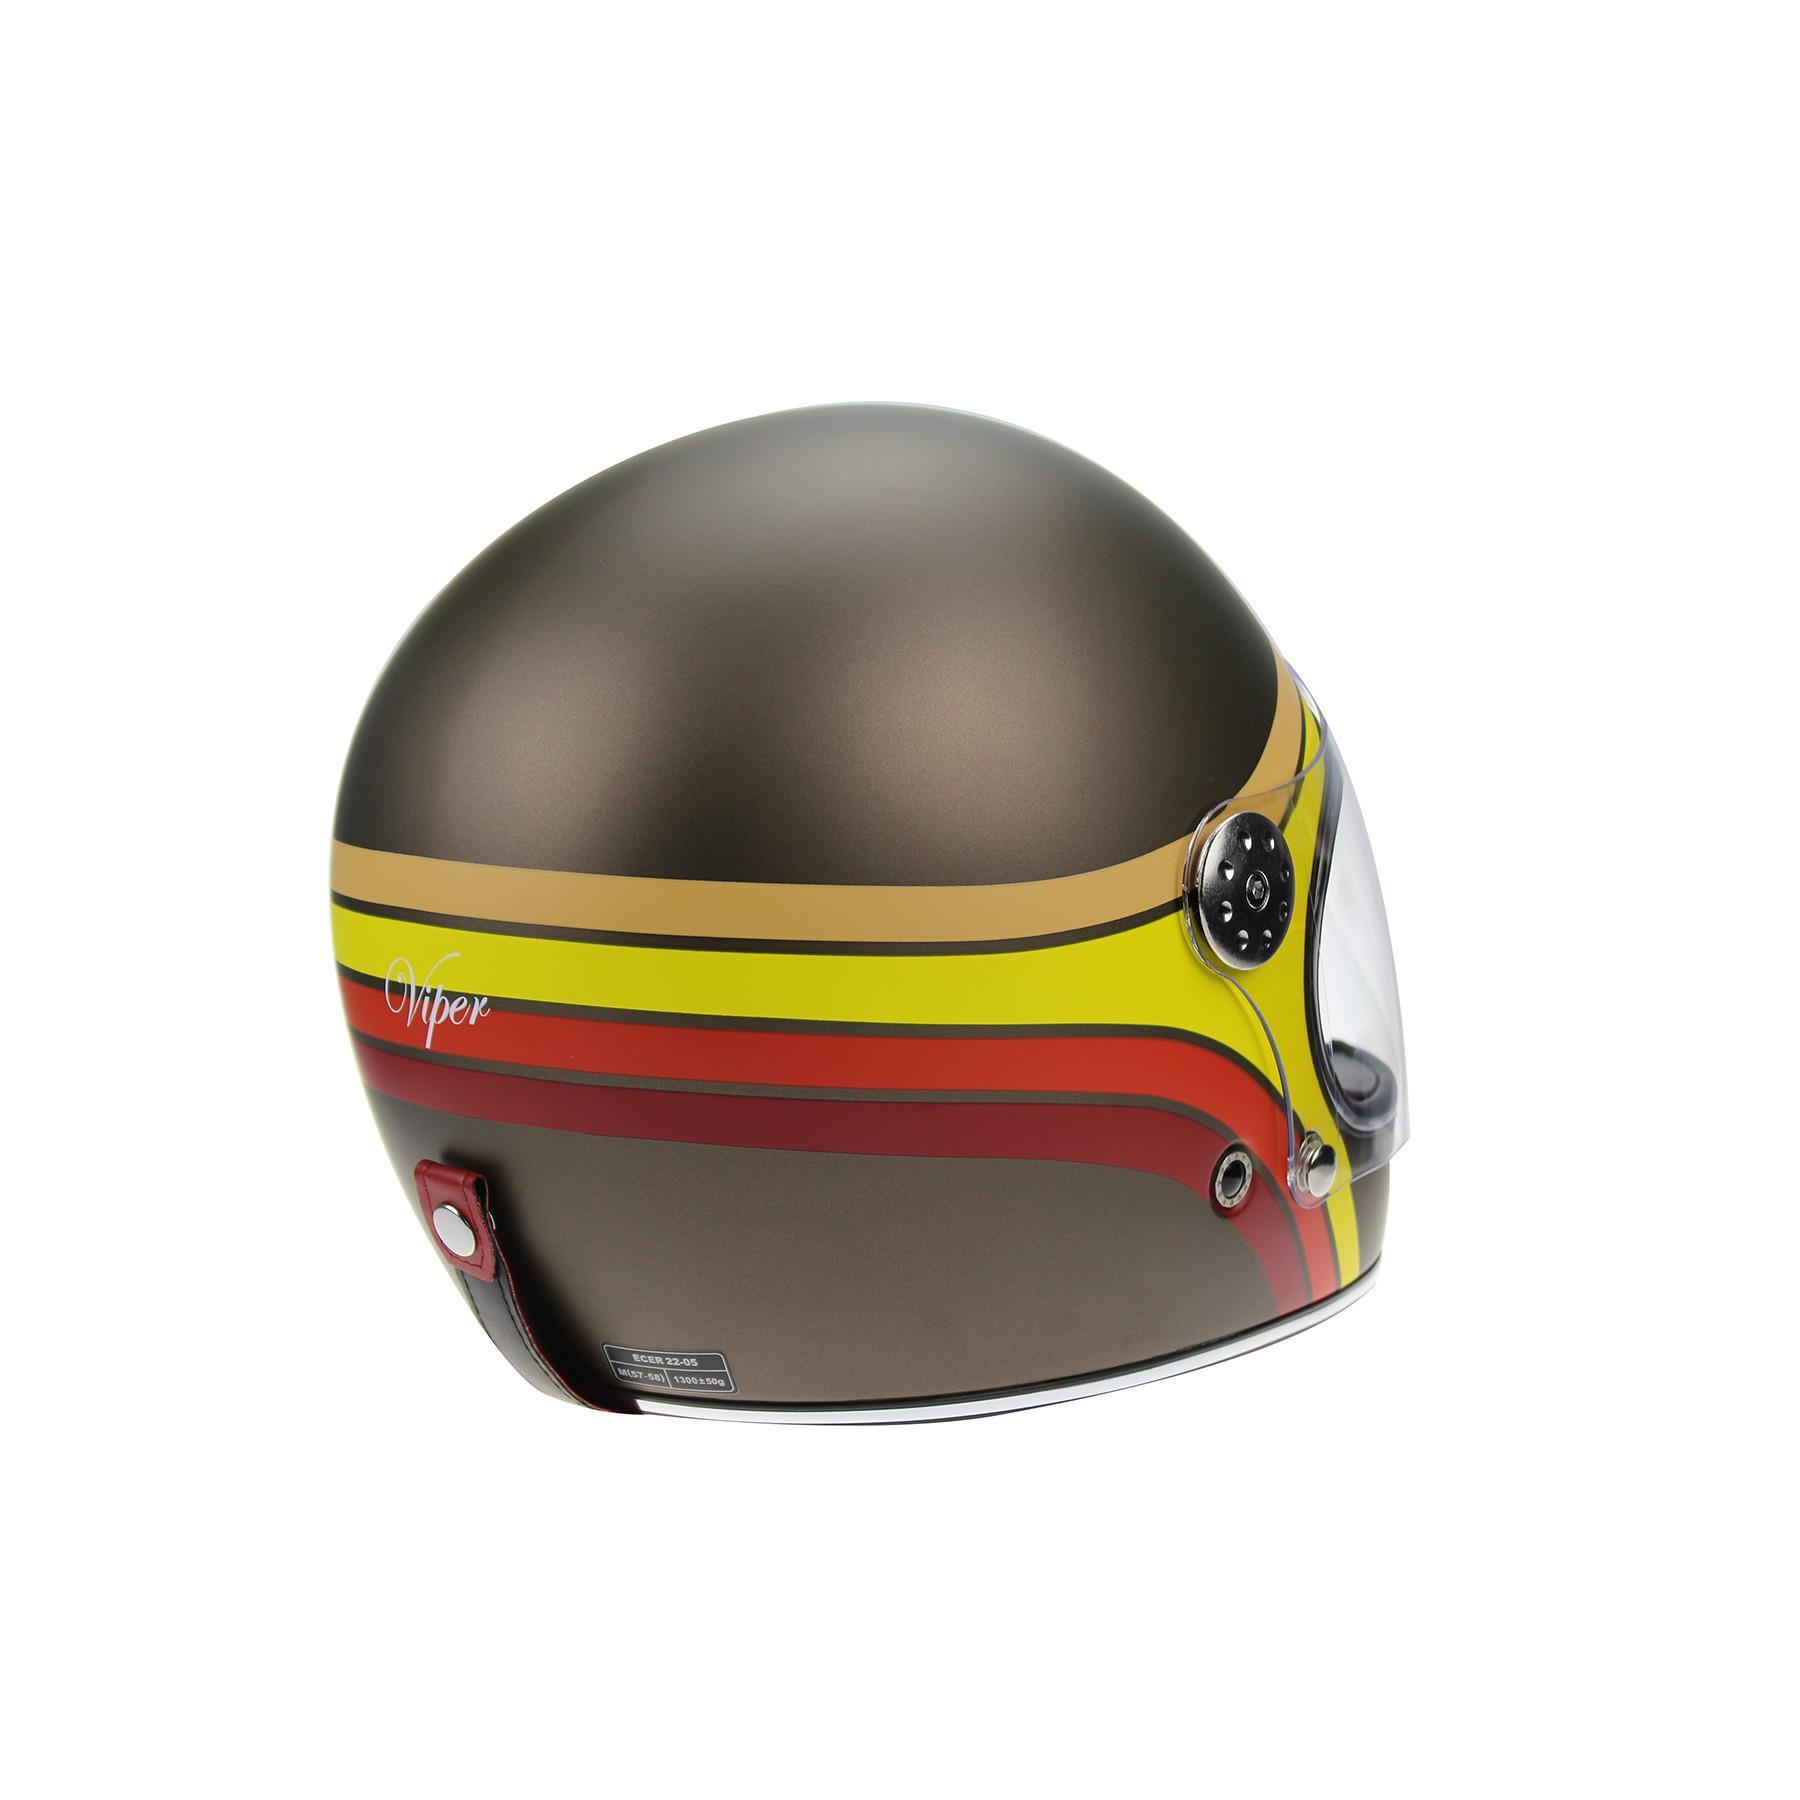 Viper-F656-Retro-Vintage-FibreGlass-Full-Face-Motorcycle-Bike-Road-Crash-Helmet miniature 30